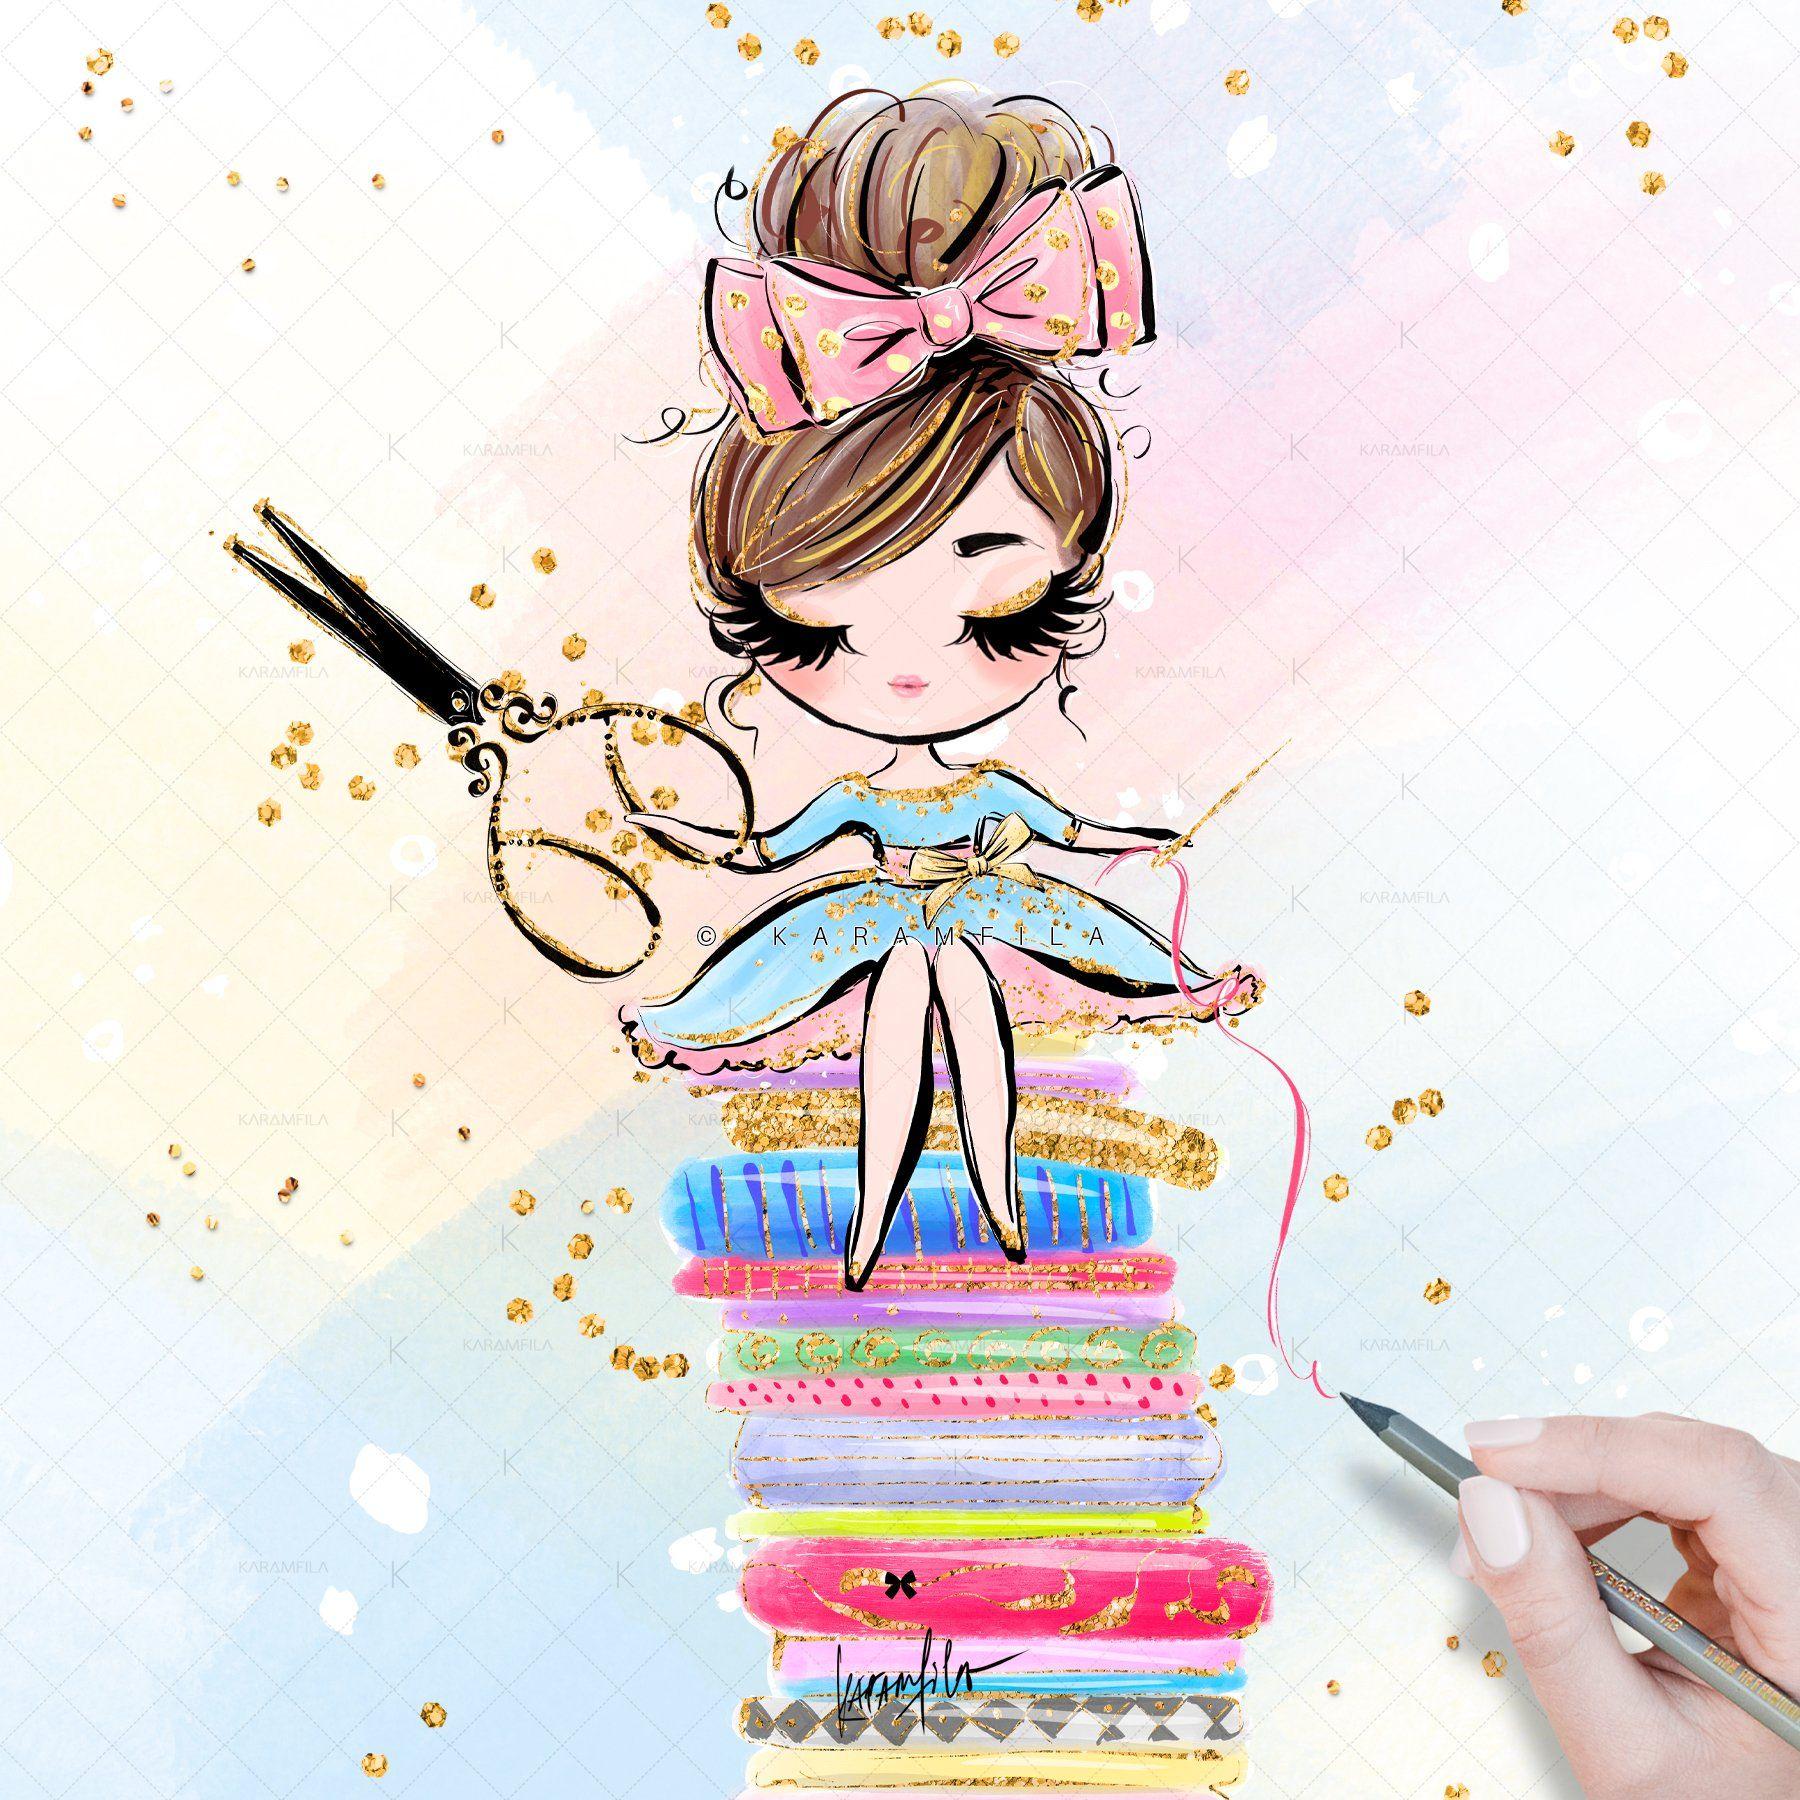 Sewing Clipart Sewing Clipart Sewing Art Craft Logo